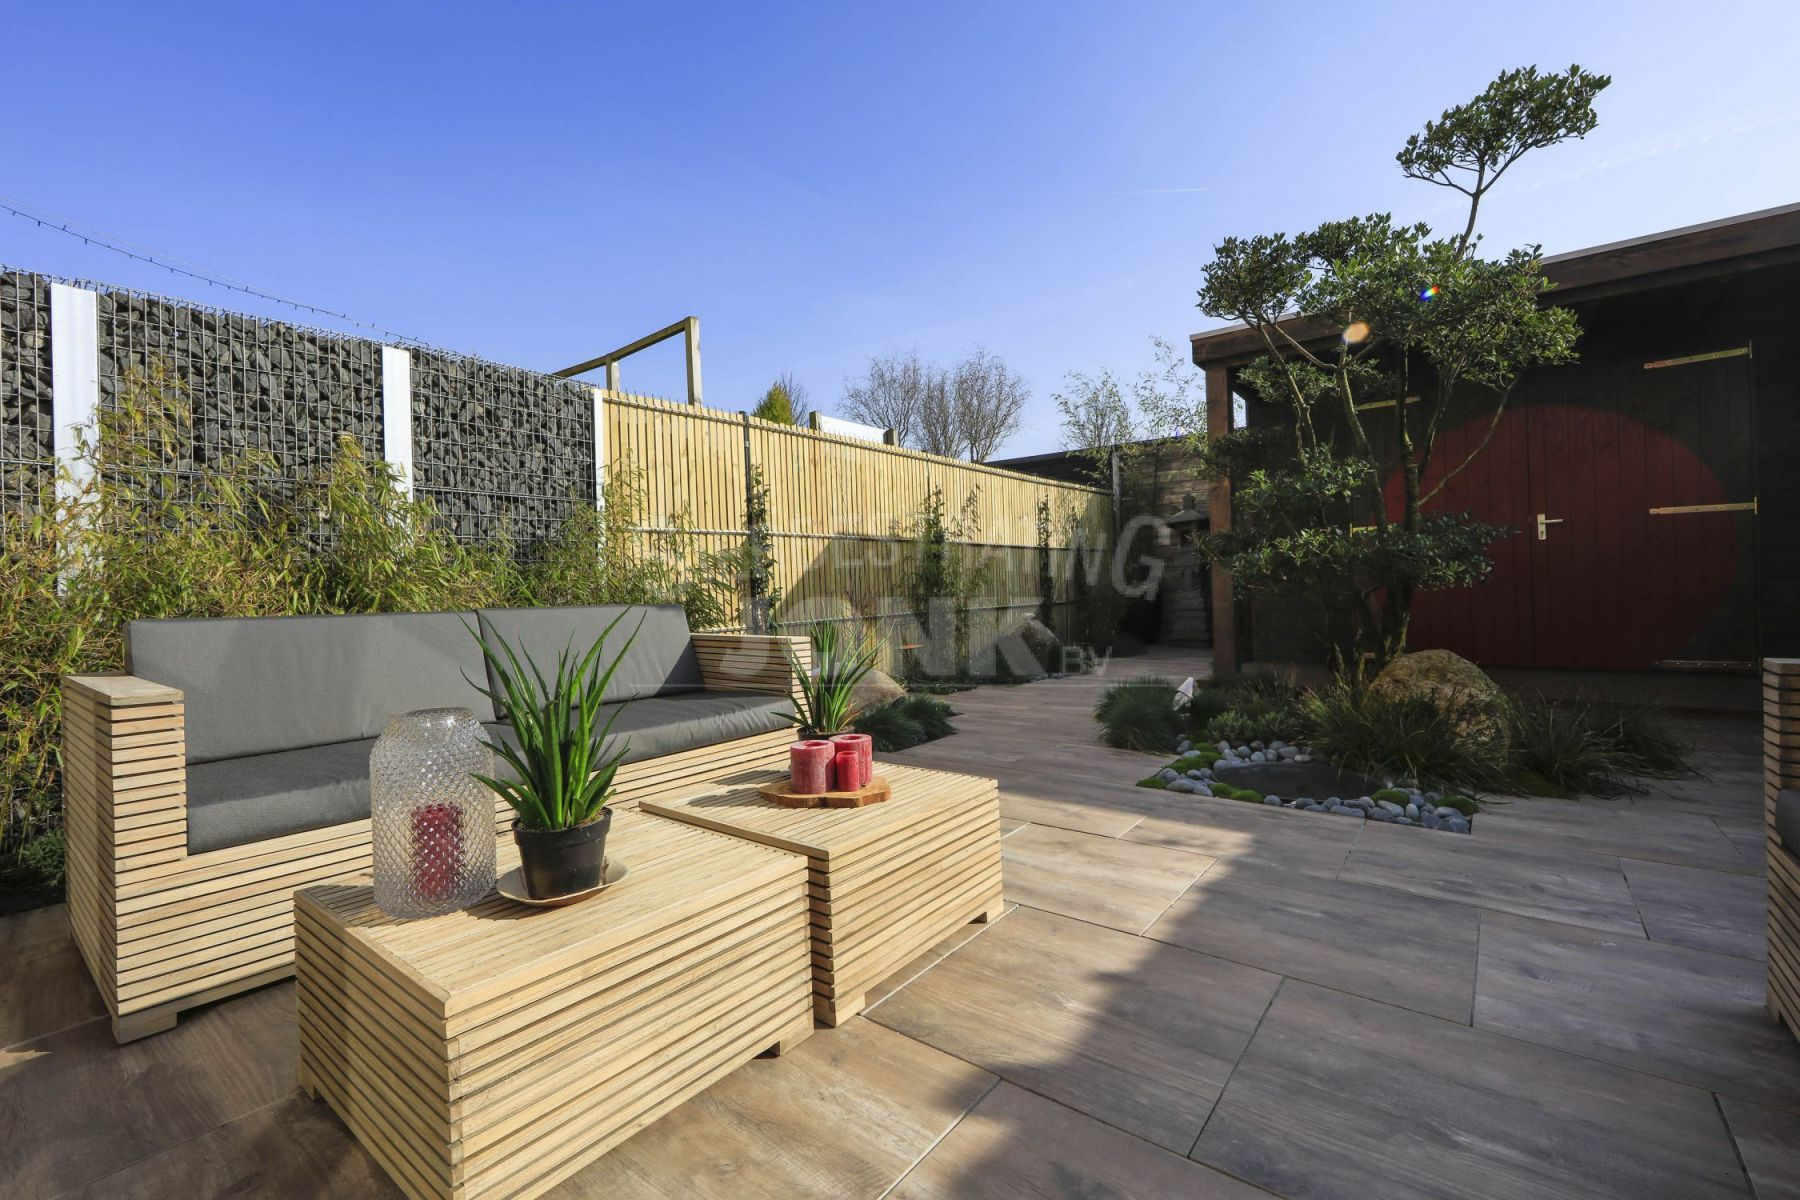 Geoceramica timber. eigen huis & tuin. terrastegels tuintegels